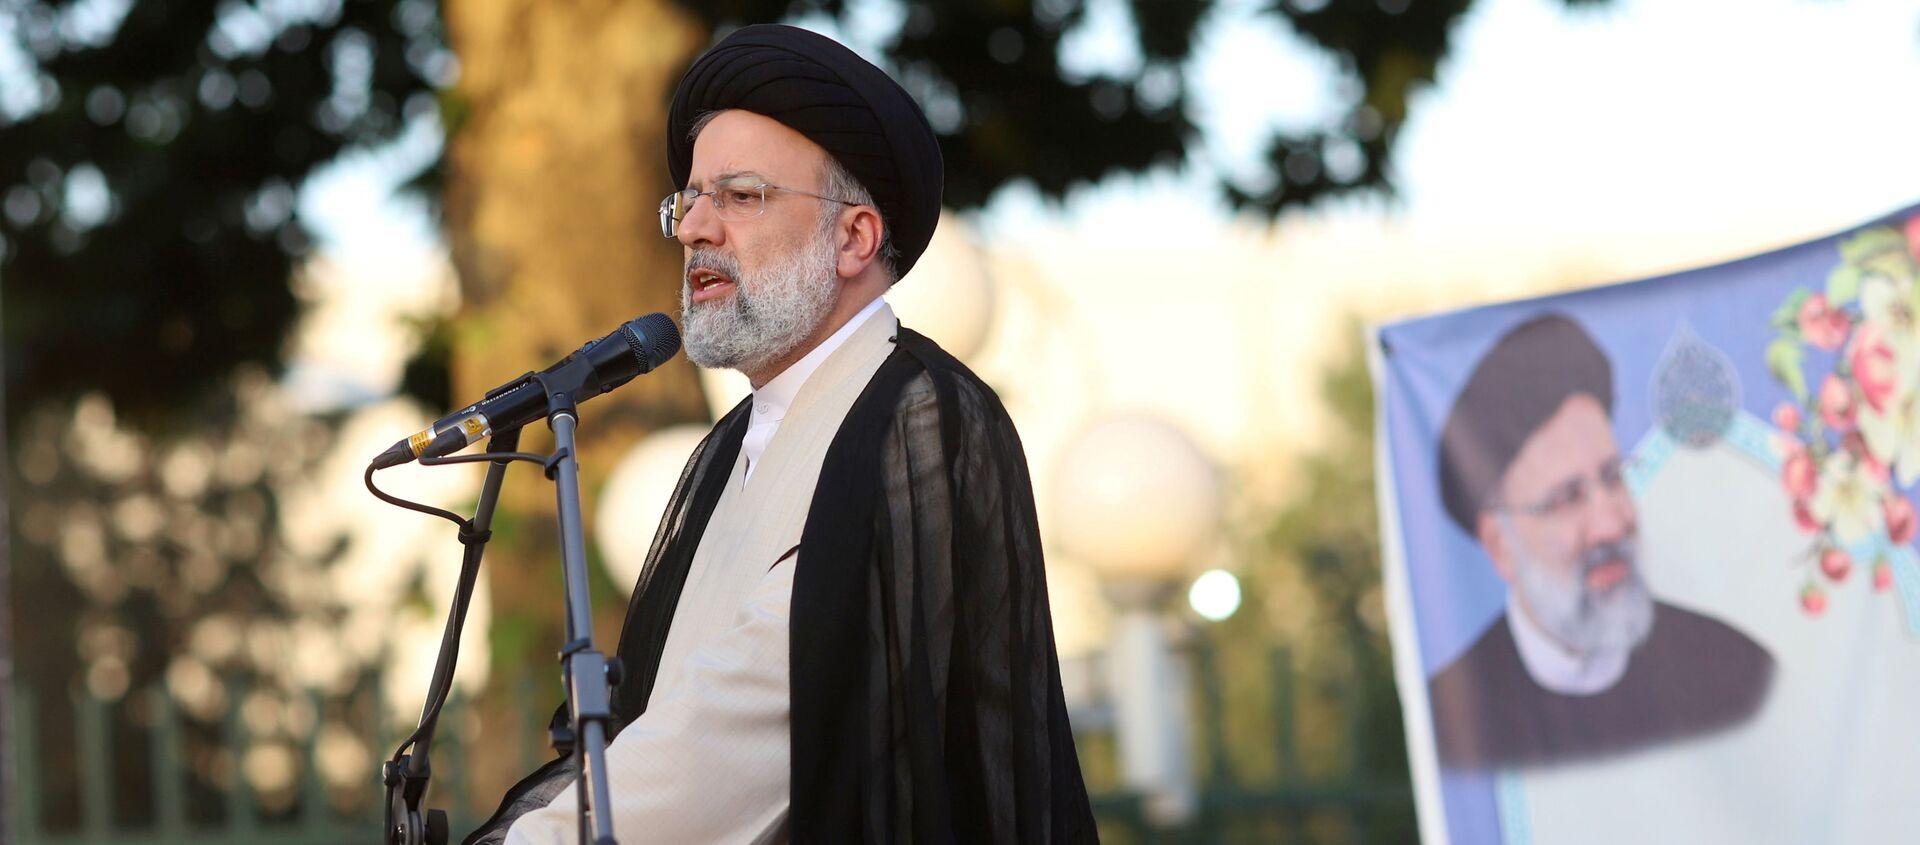 Presidential candidate Ebrahim Raisi speaks during a campaign rally in Tehran, Iran June 15, 2021. Majid Asgaripour/WANA (West Asia News Agency) via REUTERS  - Sputnik International, 1920, 19.06.2021